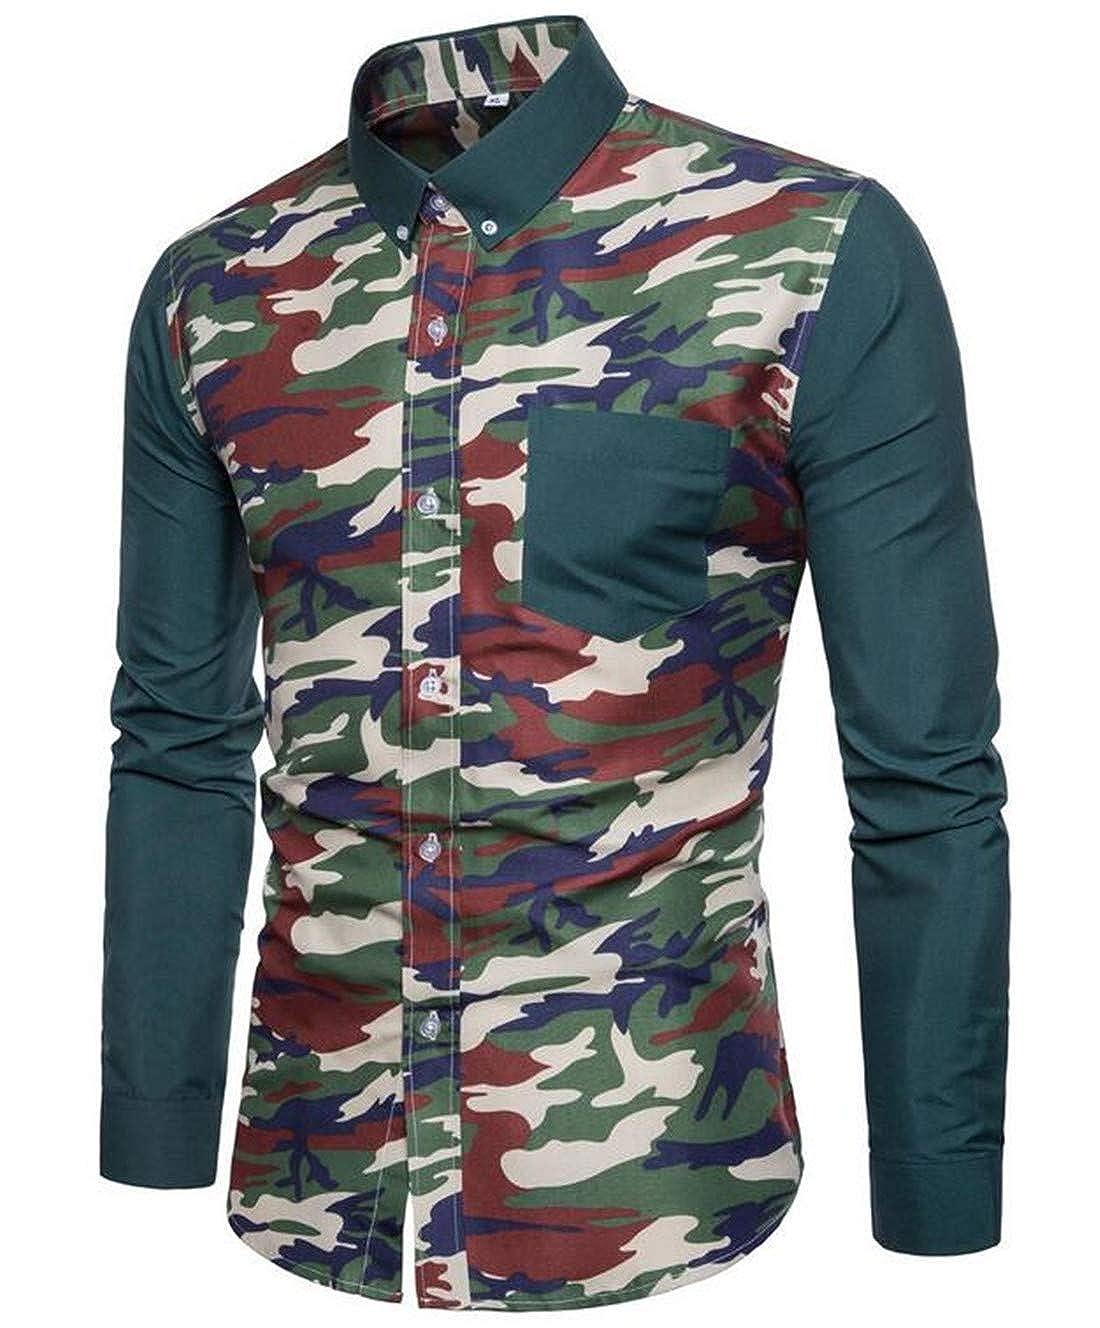 Nanquan Men Basic Camouflage Print Raglan Sleeves Slim Fit Button Down Shirt